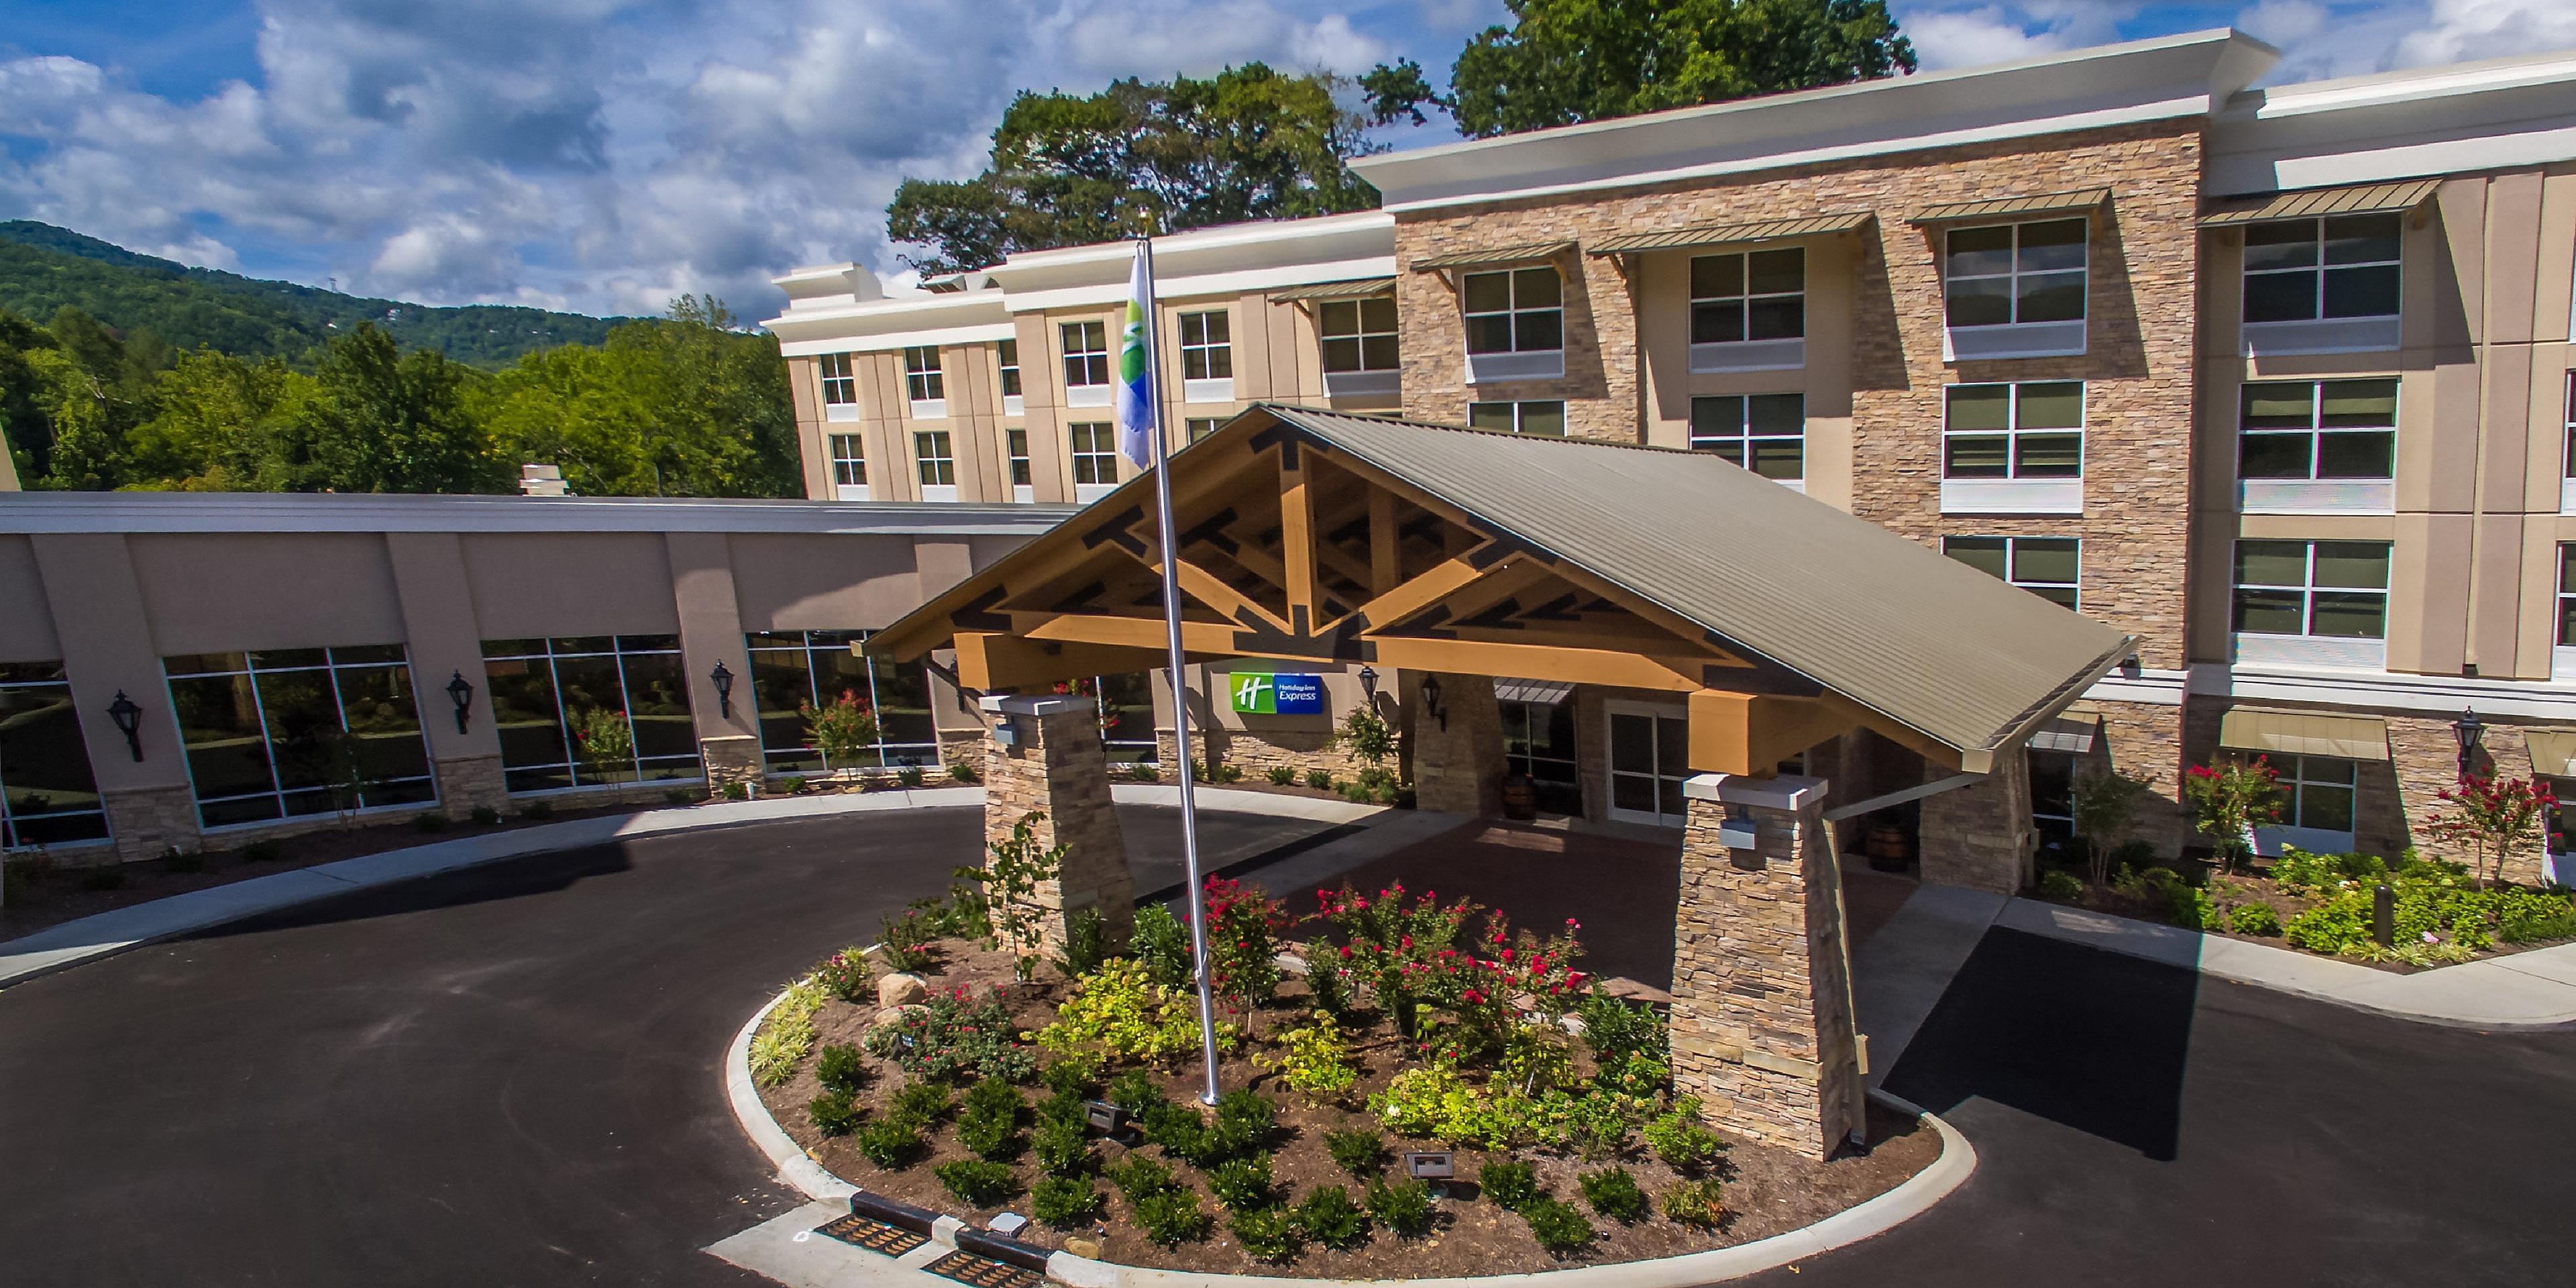 Gatlinburg Tn Hotels >> Downtown Gatlinburg Hotel Holiday Inn Express